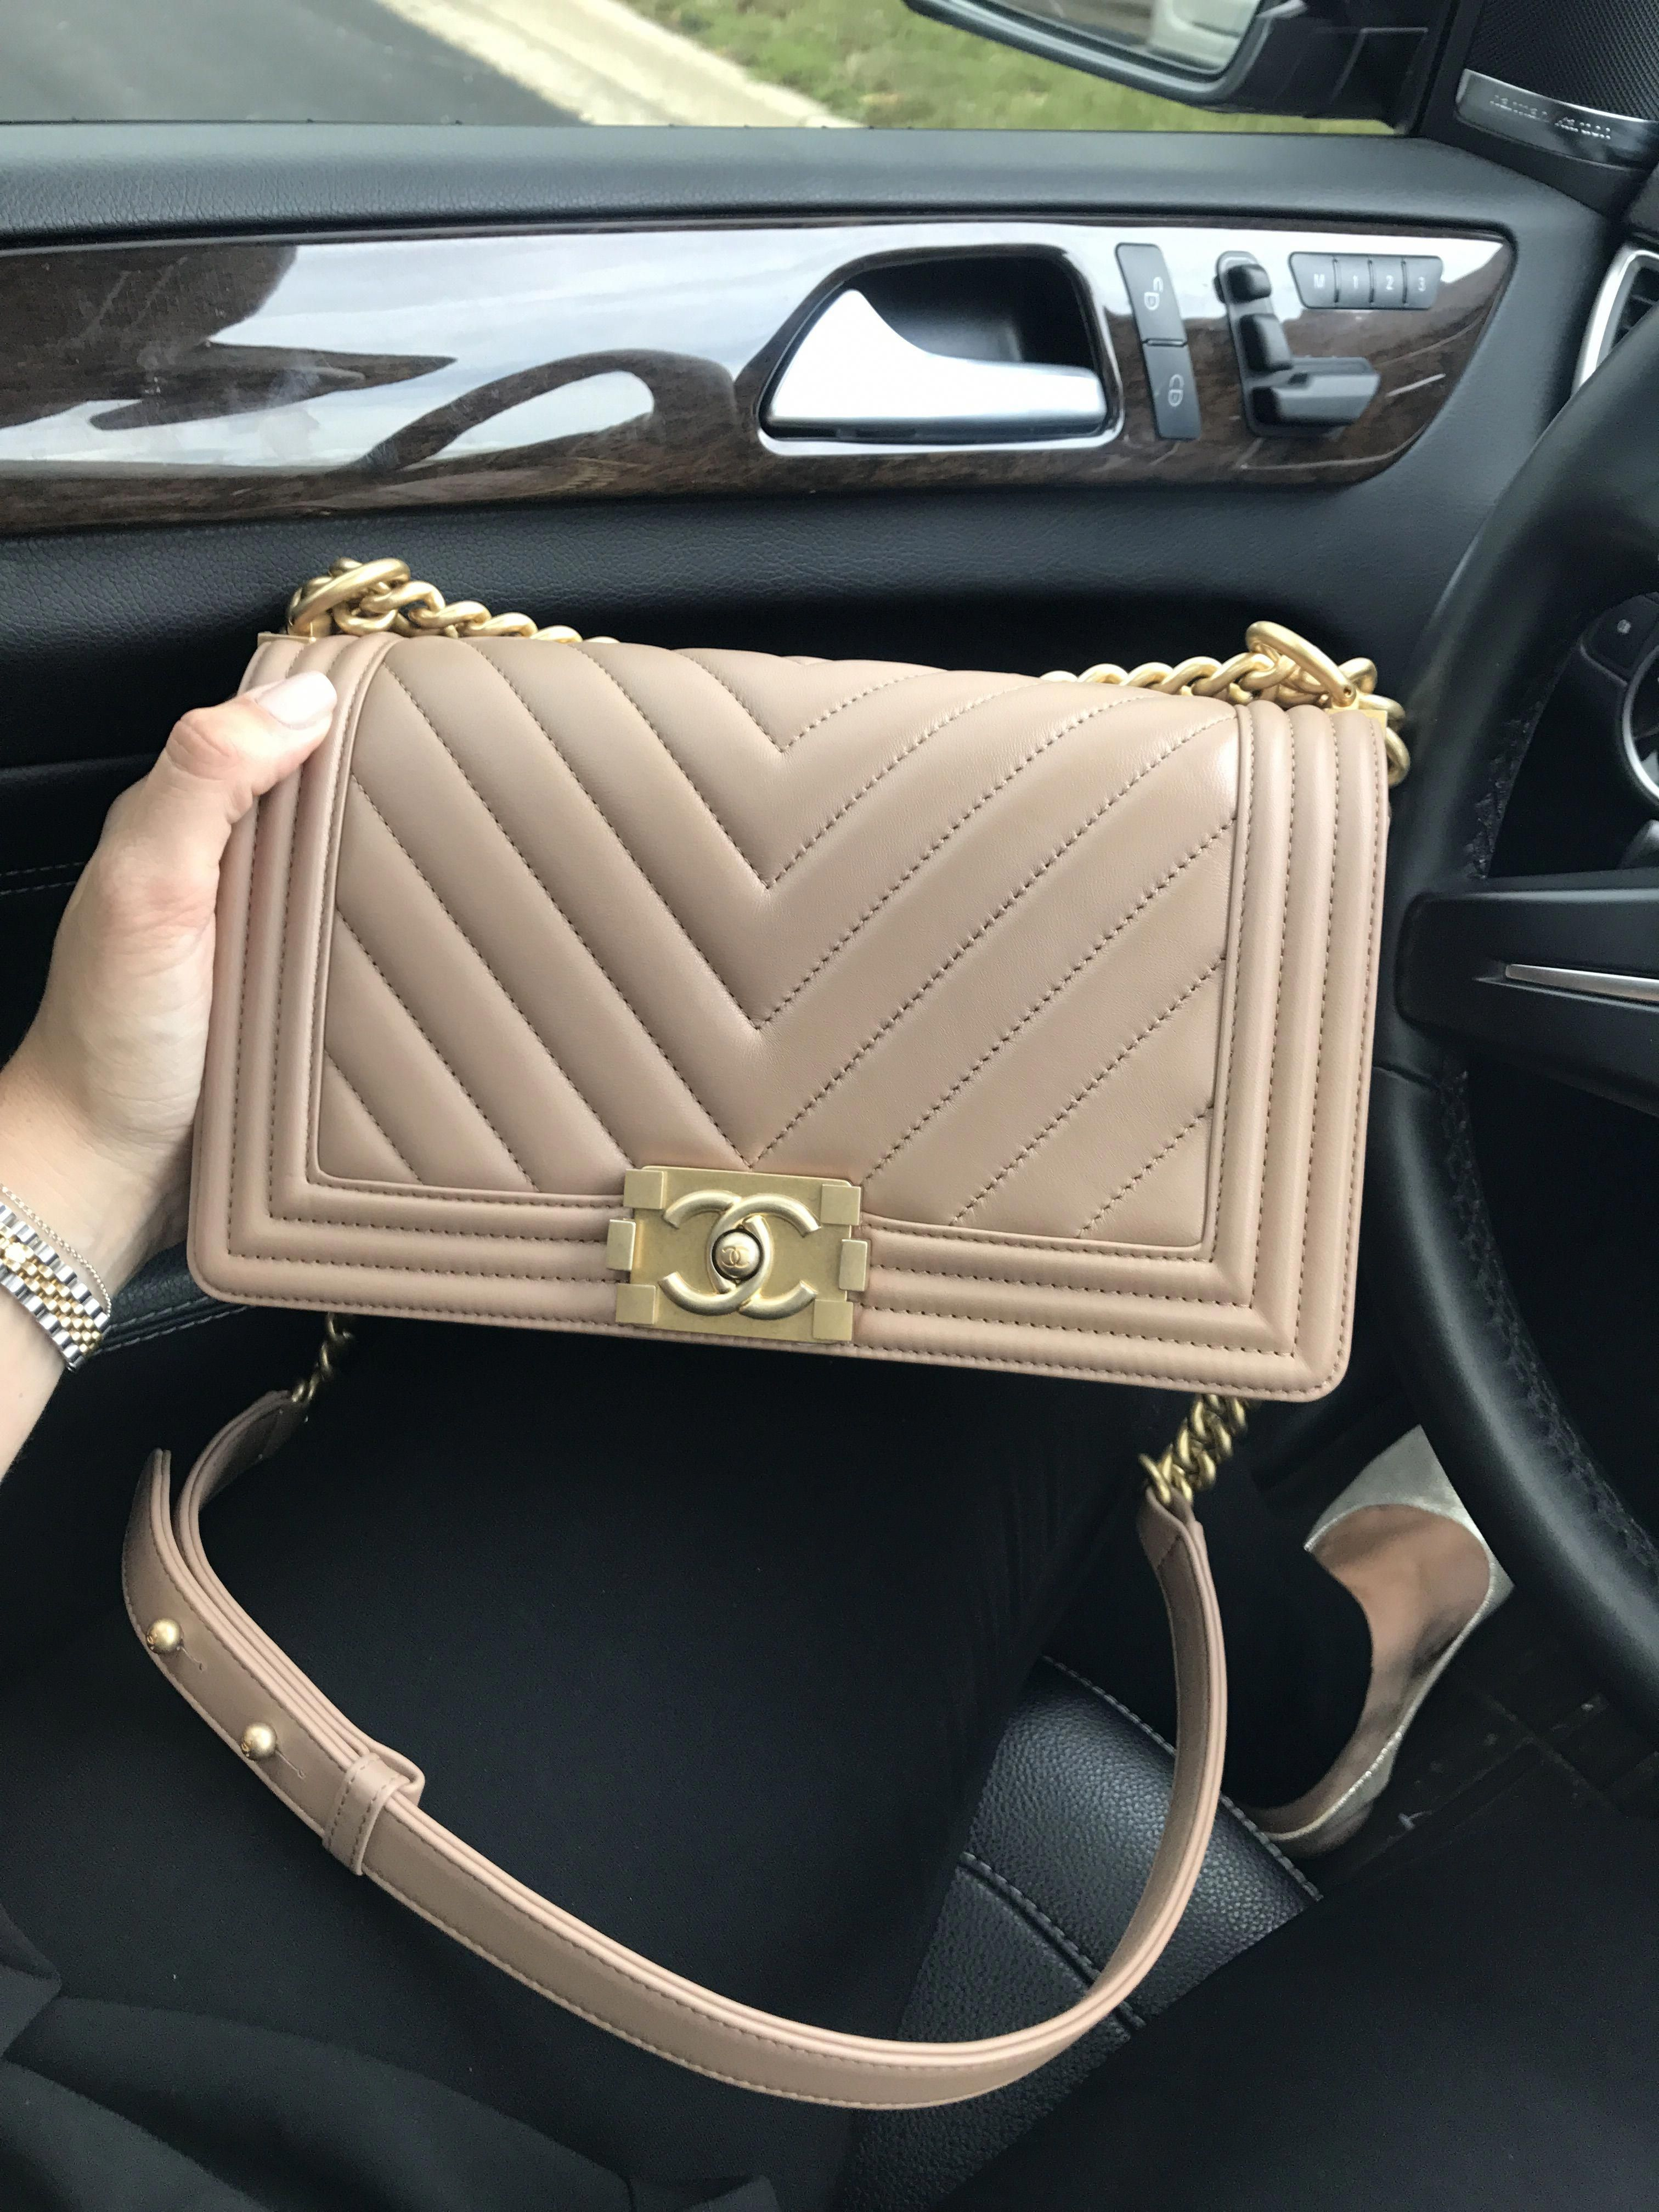 88a6b5e91cfa 2017 Chanel medium le boy bag chevron dark beige and gold hardware   Chanelhandbags